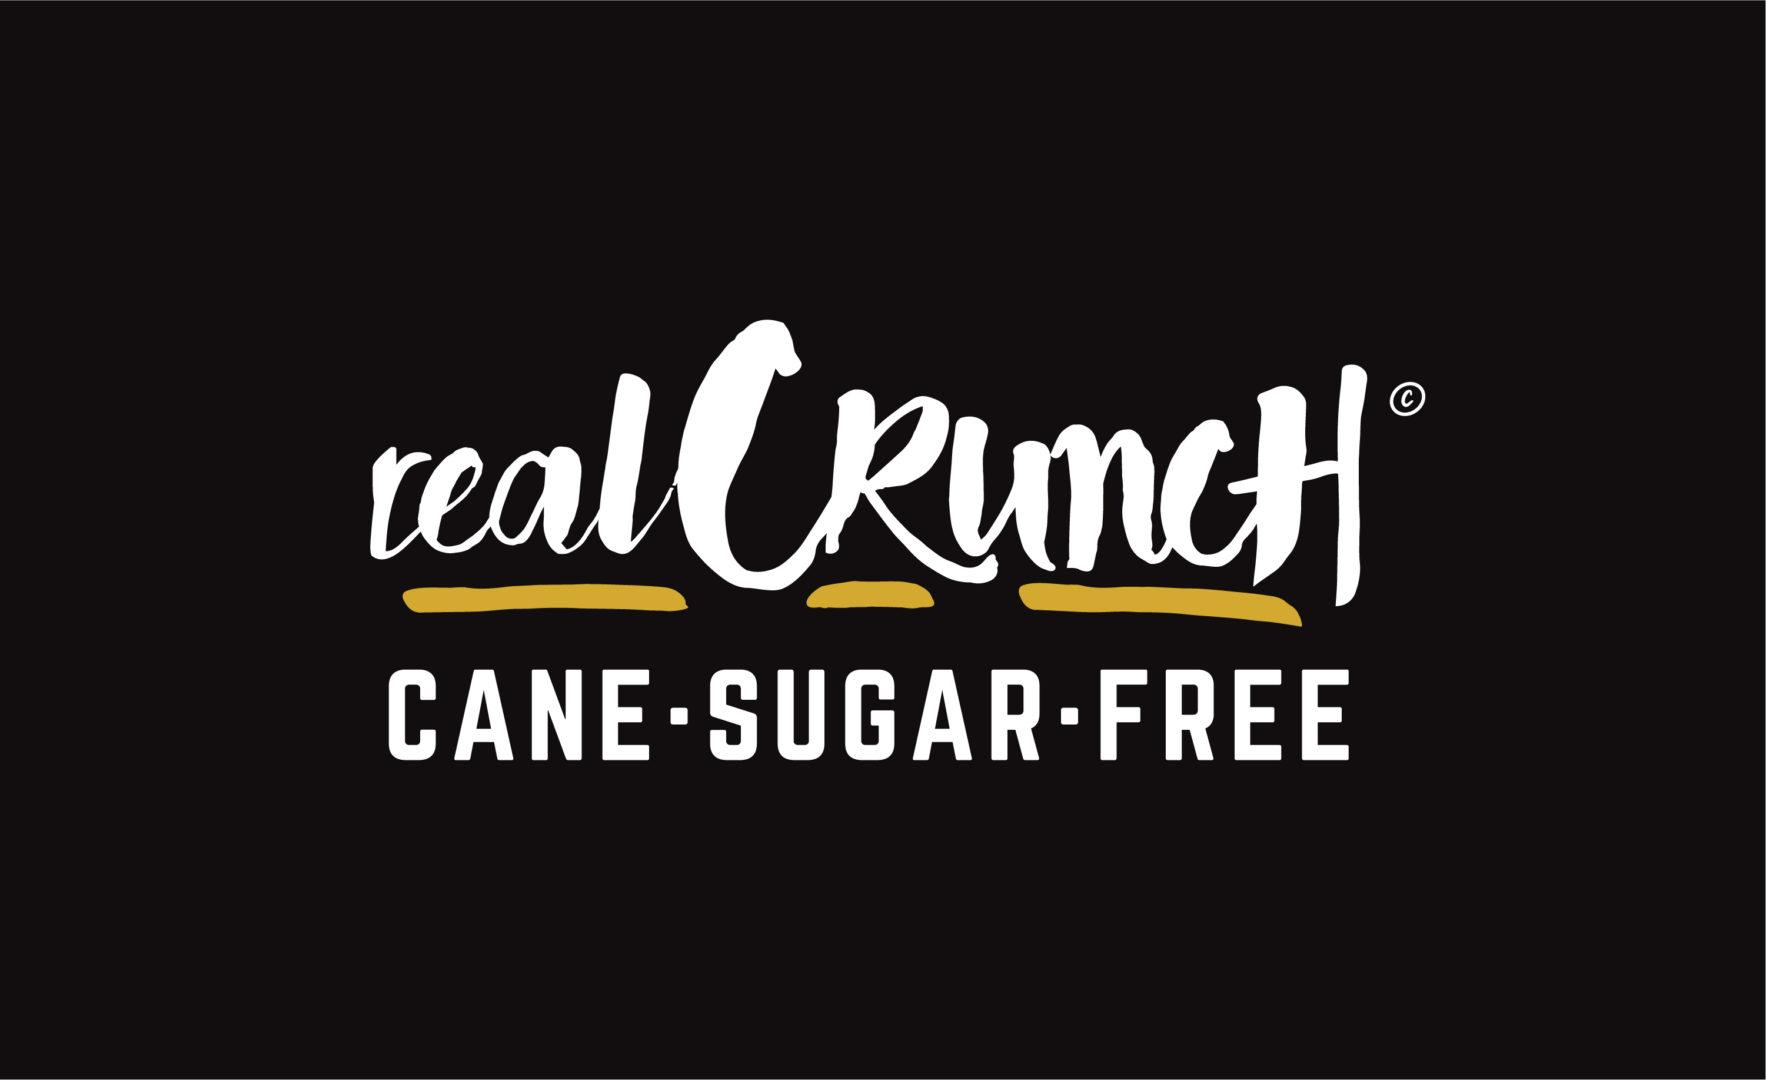 real-crunch-logomark